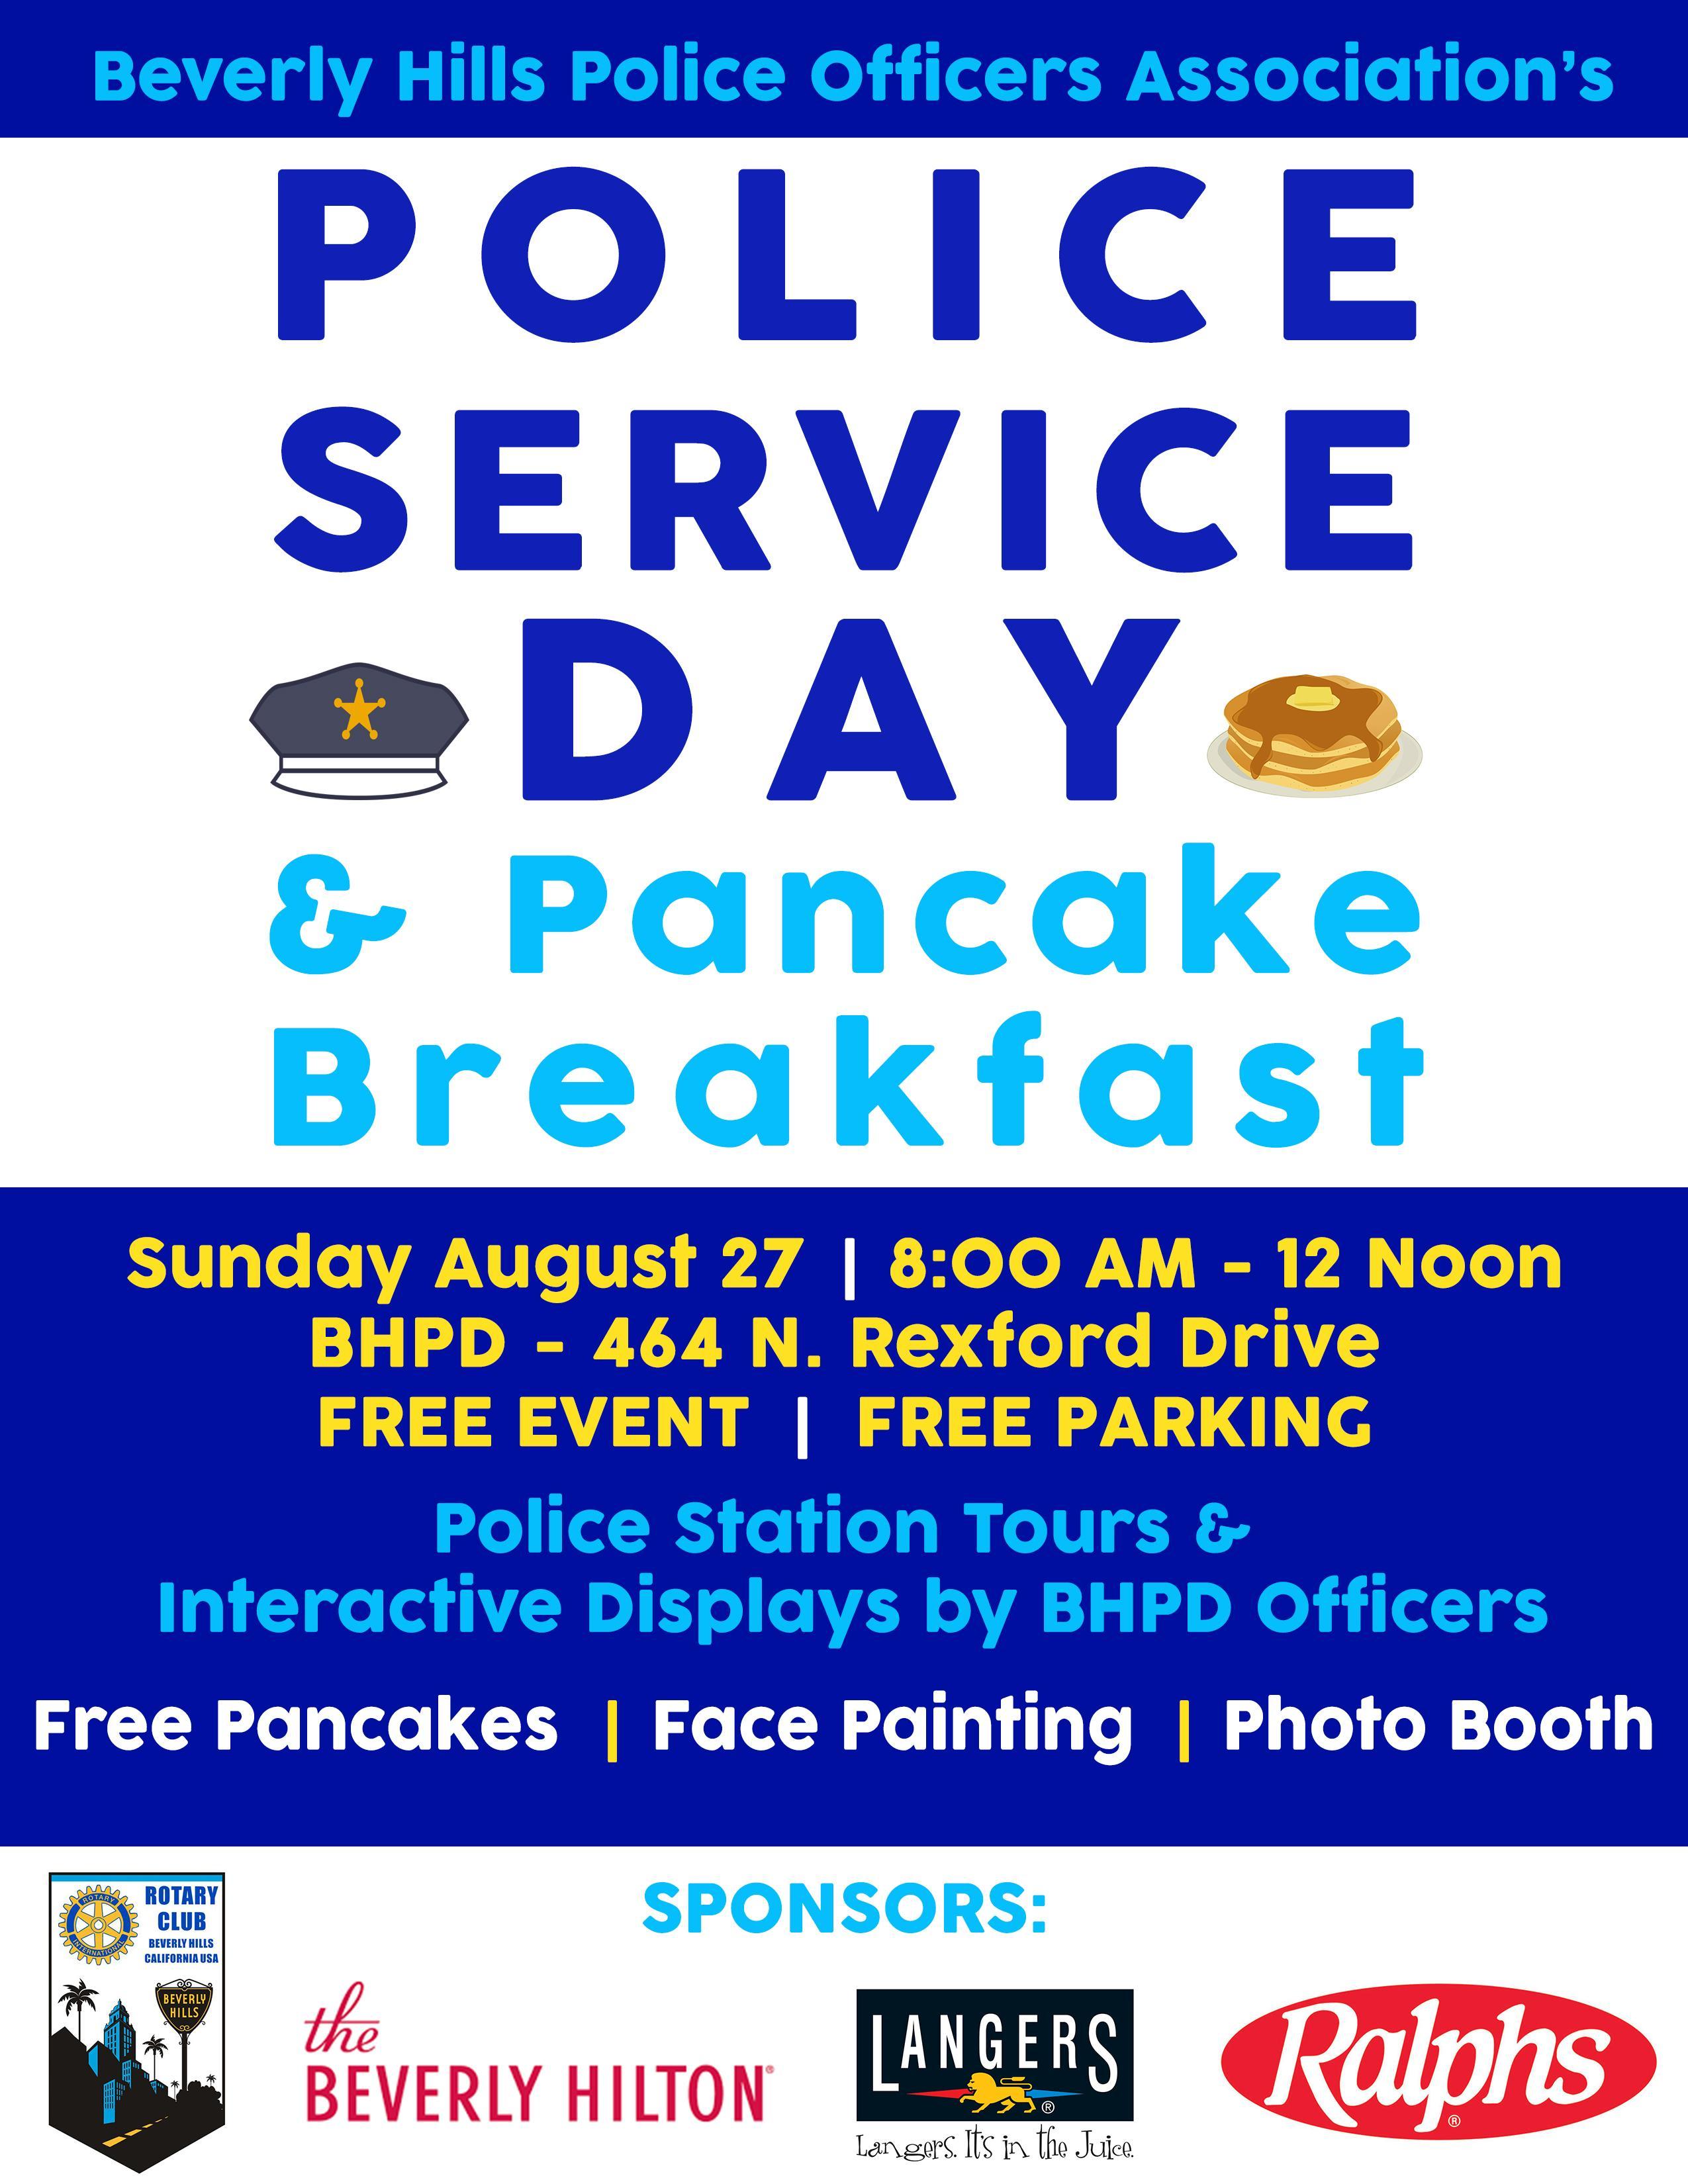 2017 Police Service Day & Pancake Breakfast